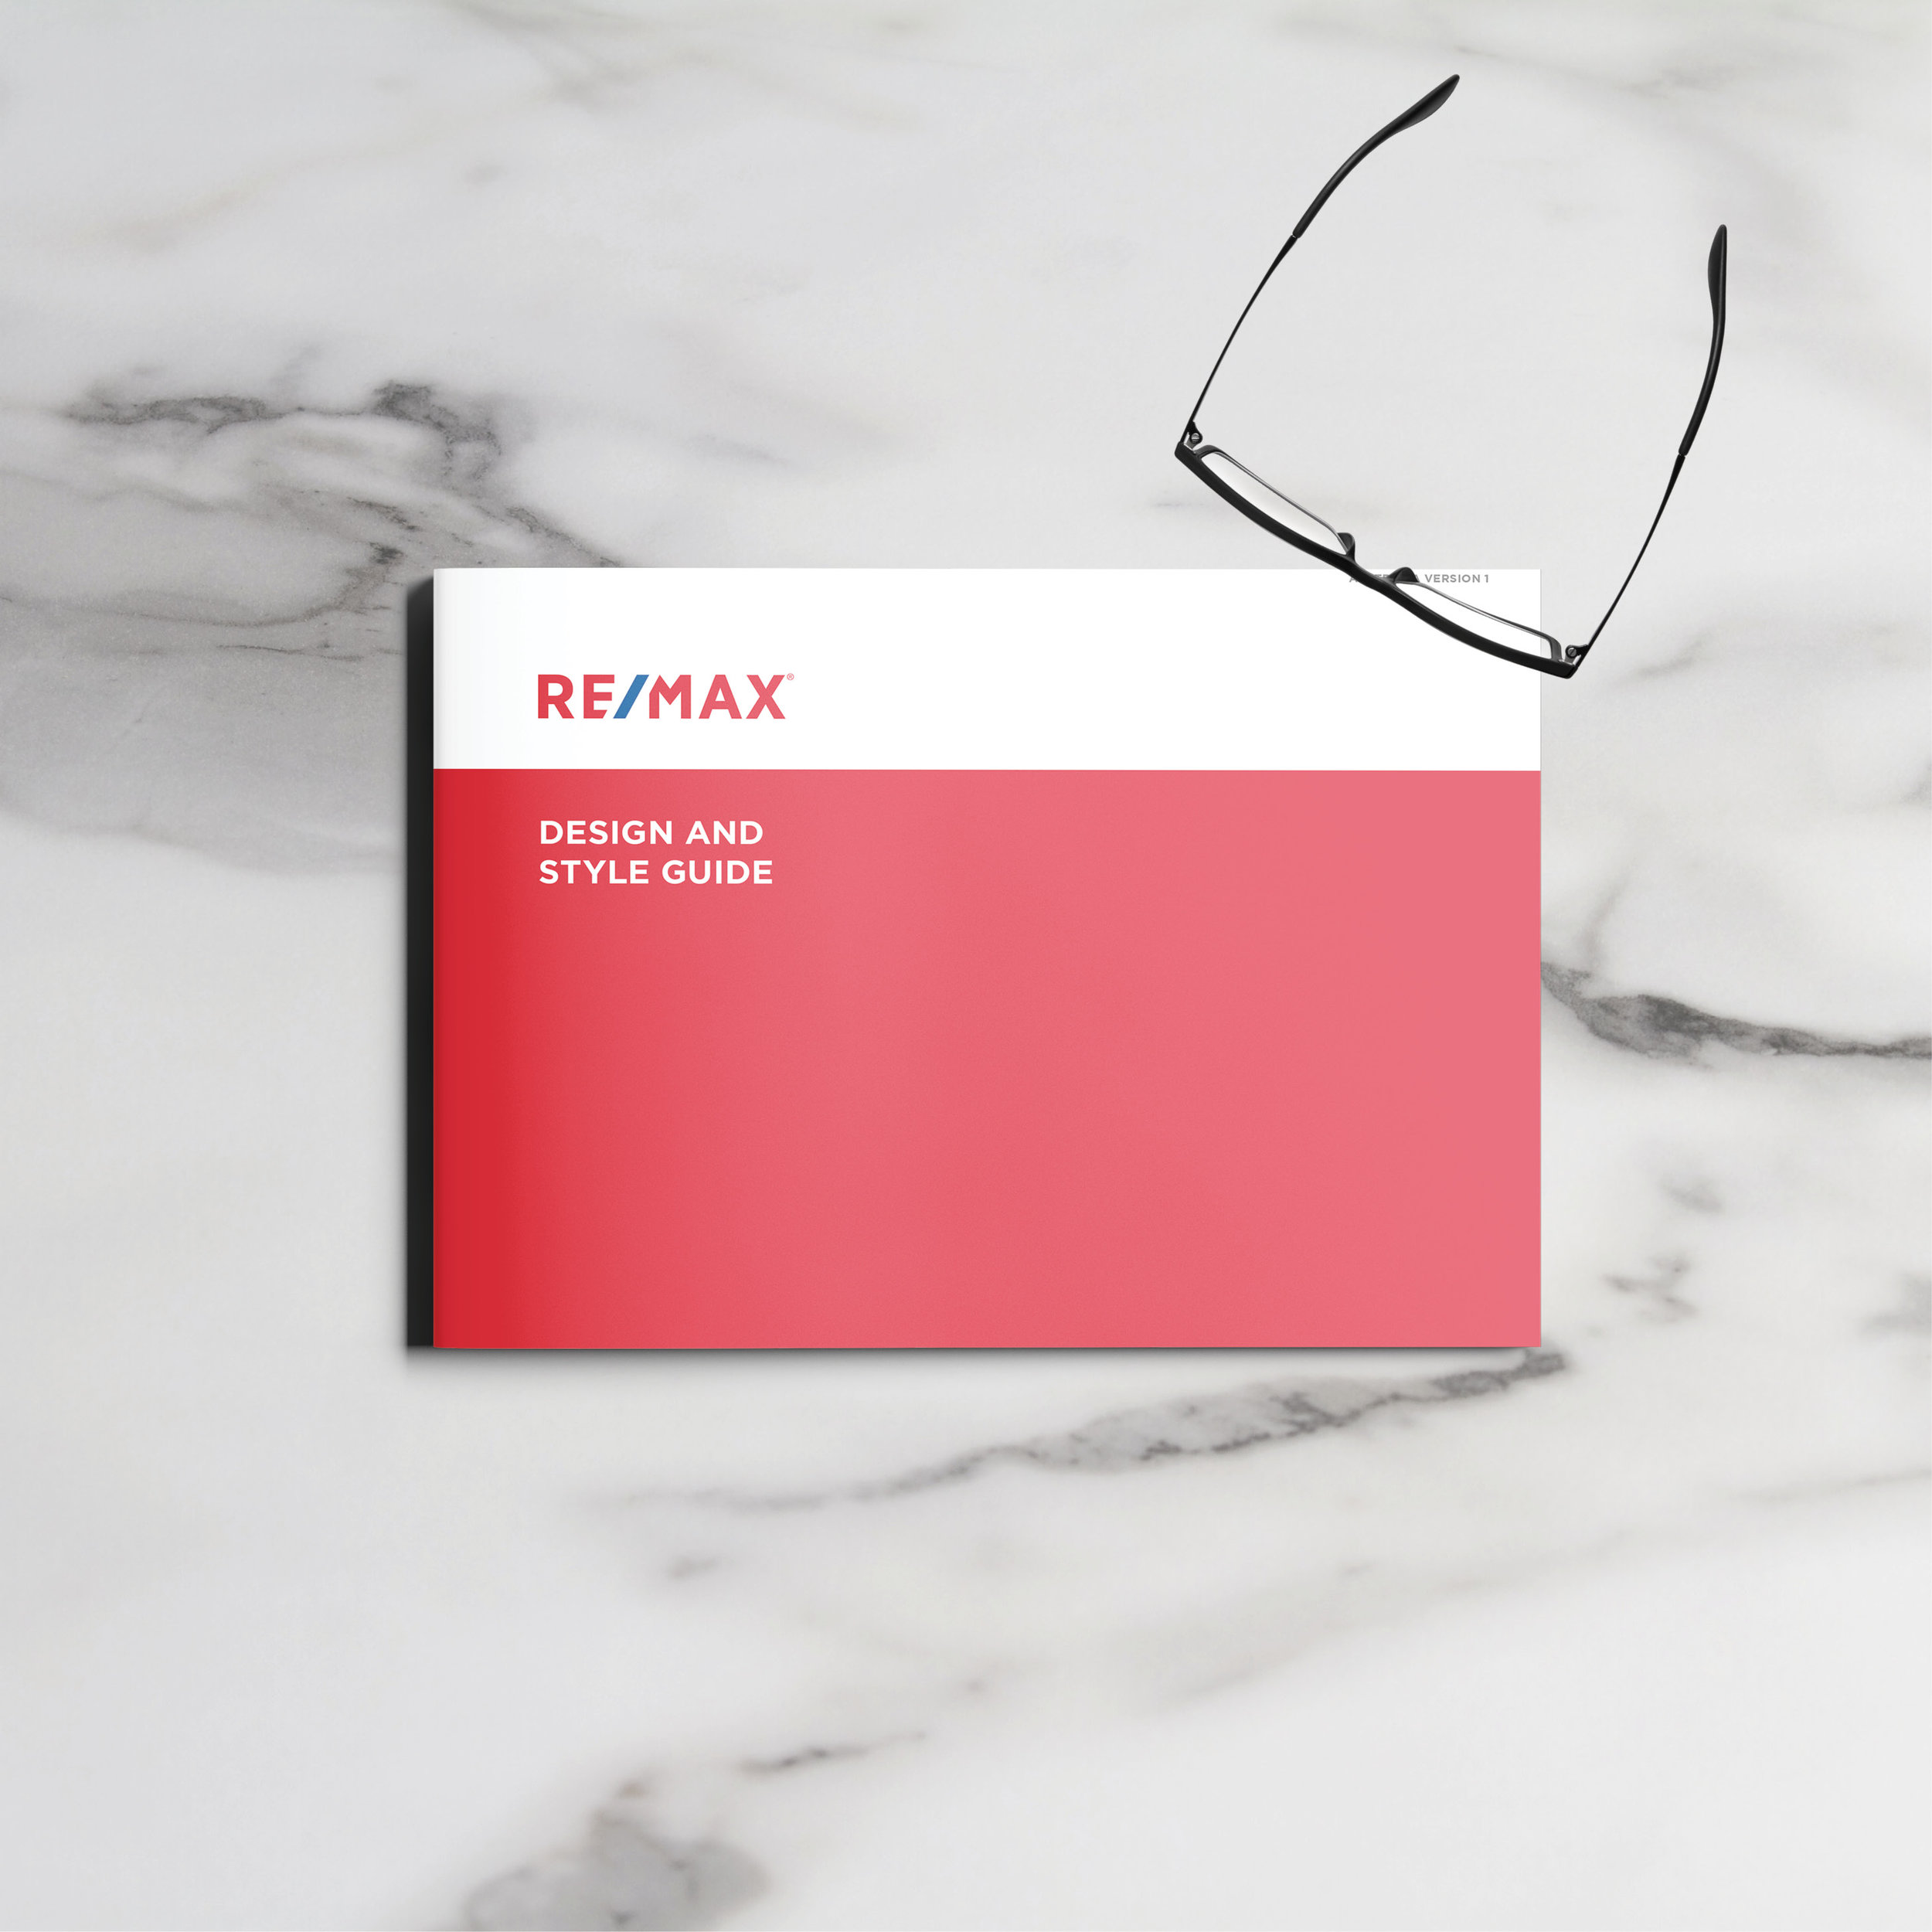 REMAX Brand refresh - Behance 17.jpg